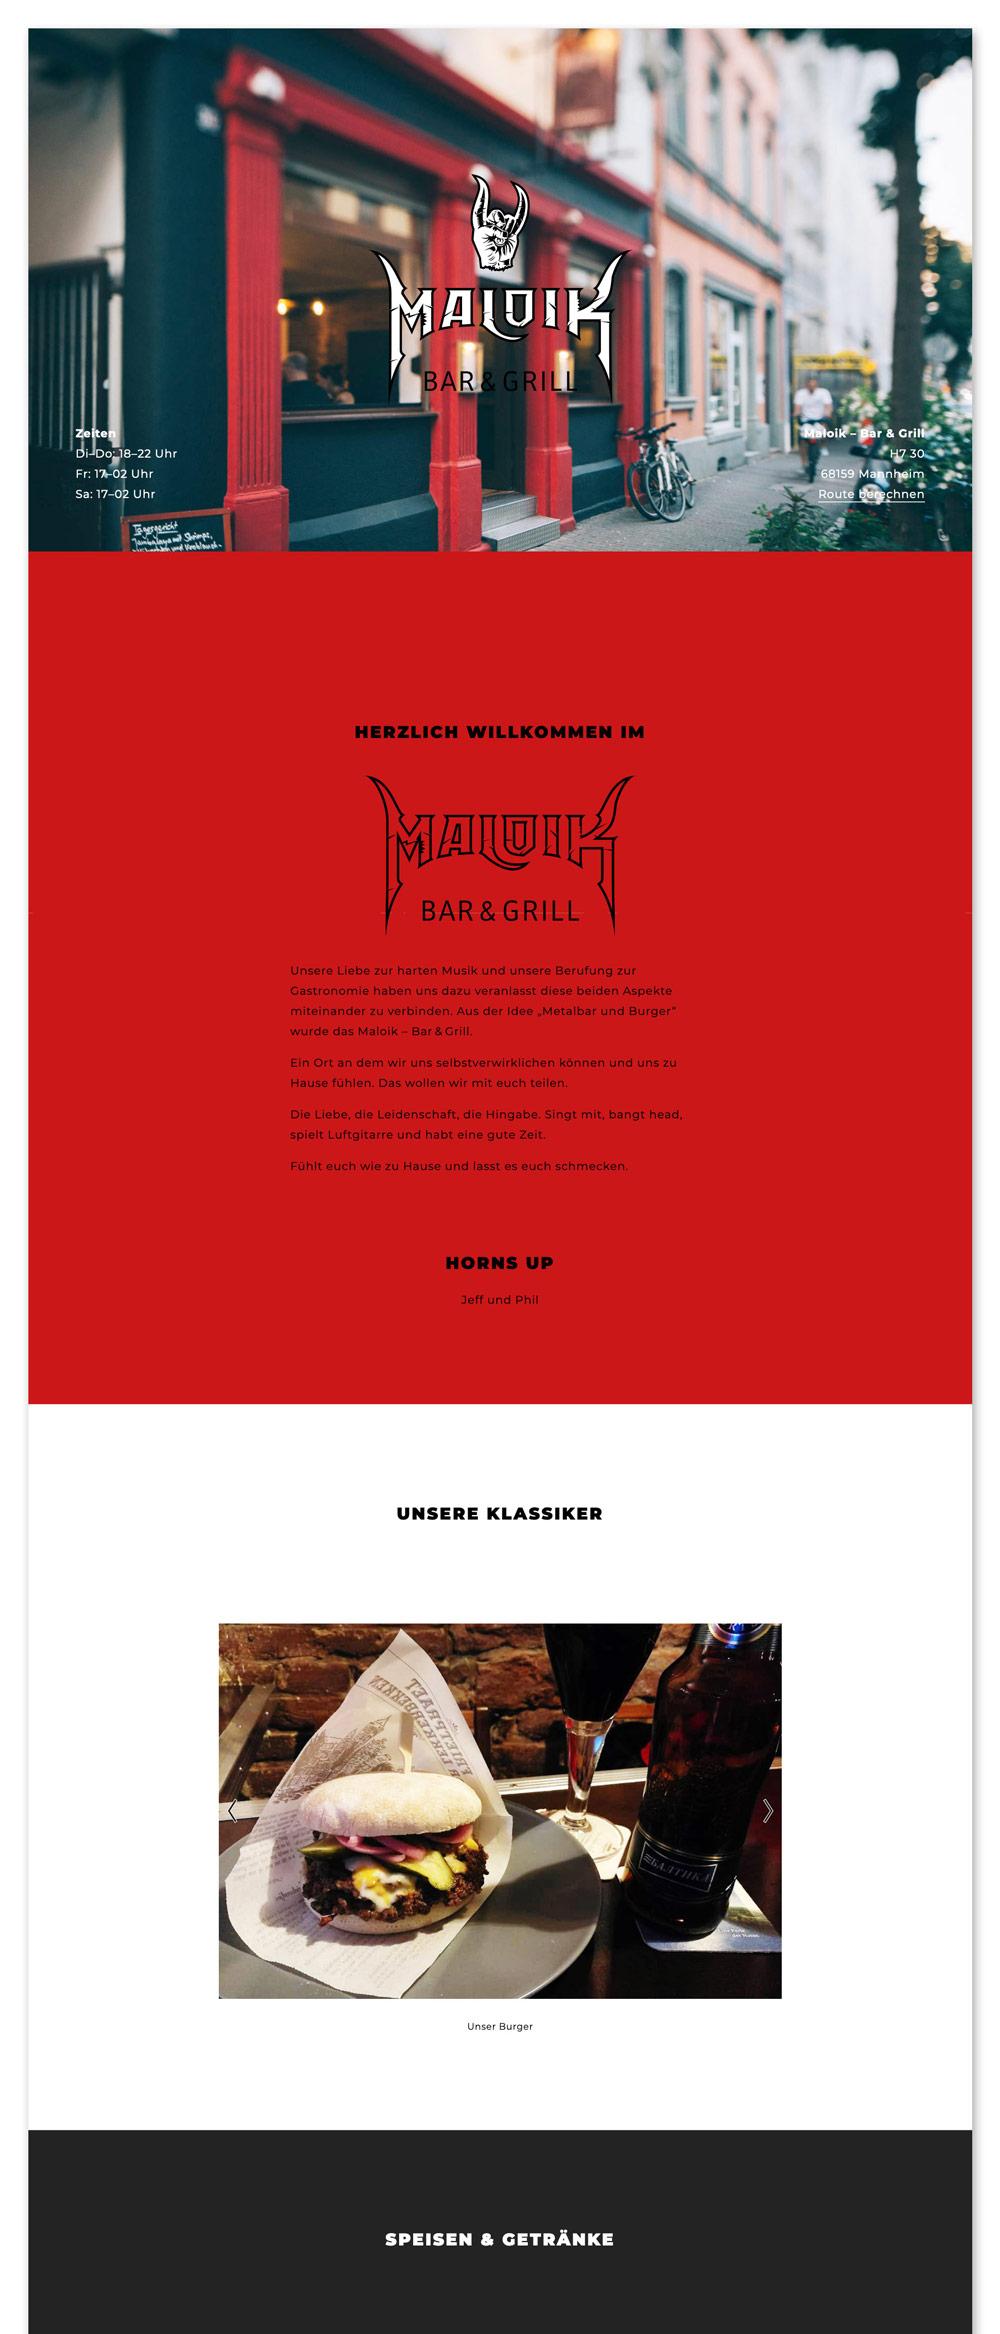 Patrick Molnar — Gestaltung Maloik